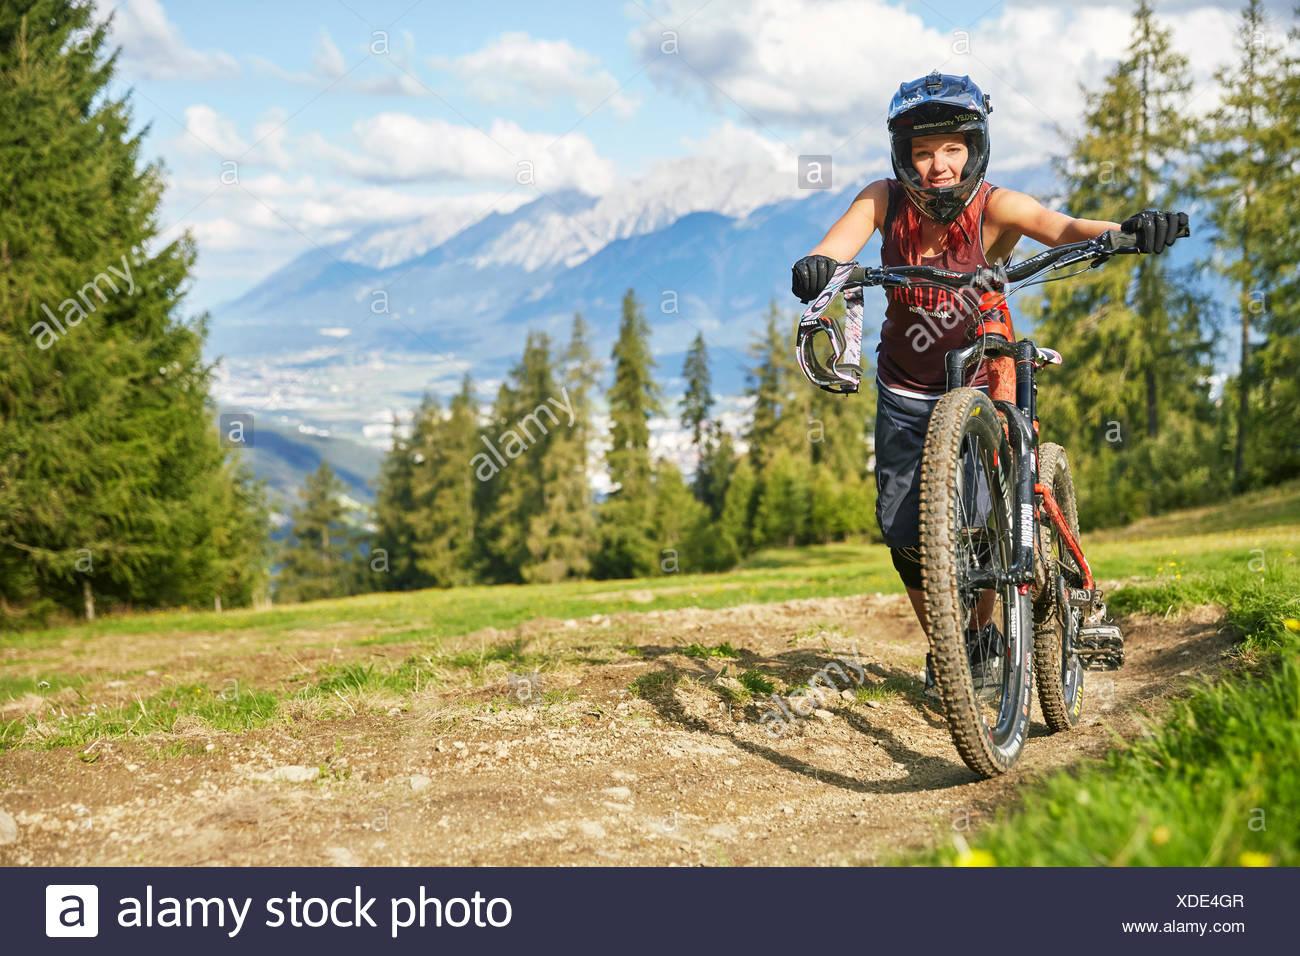 Downhill biker pushing mountain bike downhill on a trail, Inn Valley behind, Mutterer Alm, Muttereralmpark, Mutters, Tyrol - Stock Image